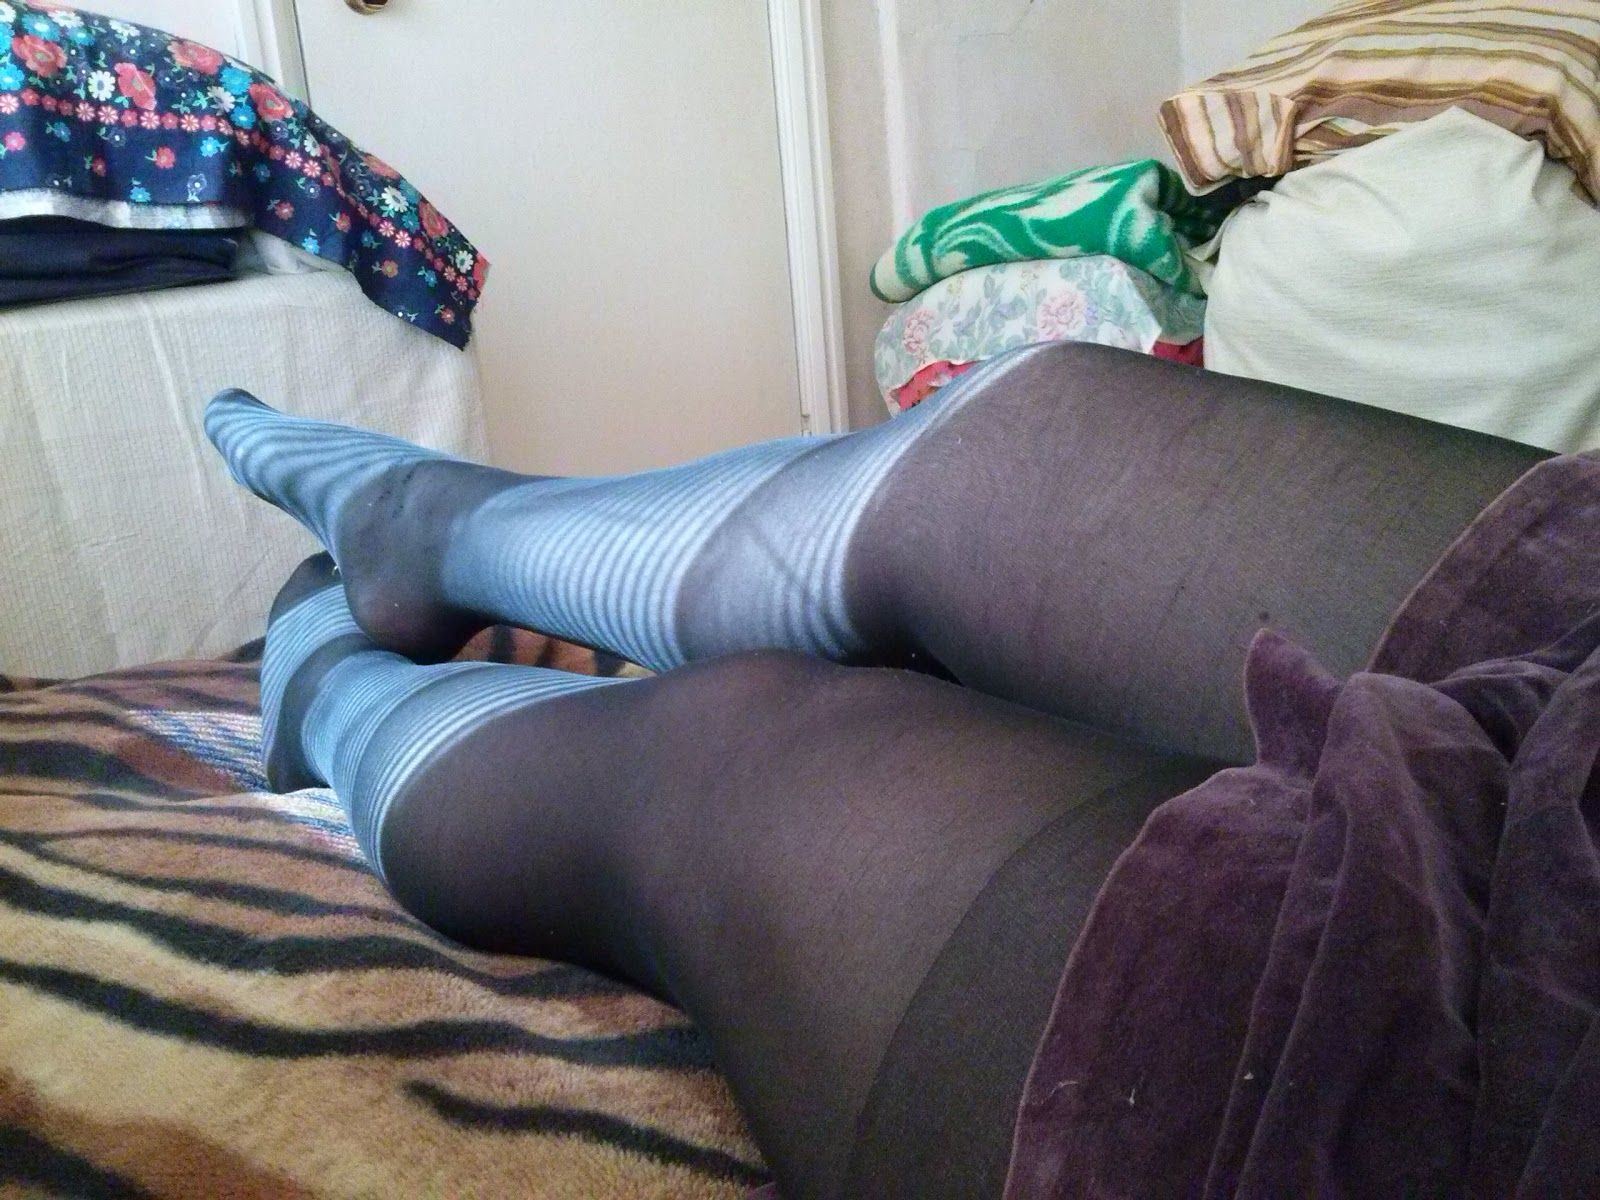 hot women stockings, sexy legs, sexy feet, legs, sexy legs, sexy feet, legs,  feet, beautiful legs, beautiful feet, legs feet, sex, sexy, sex legs, sex  girl, ...